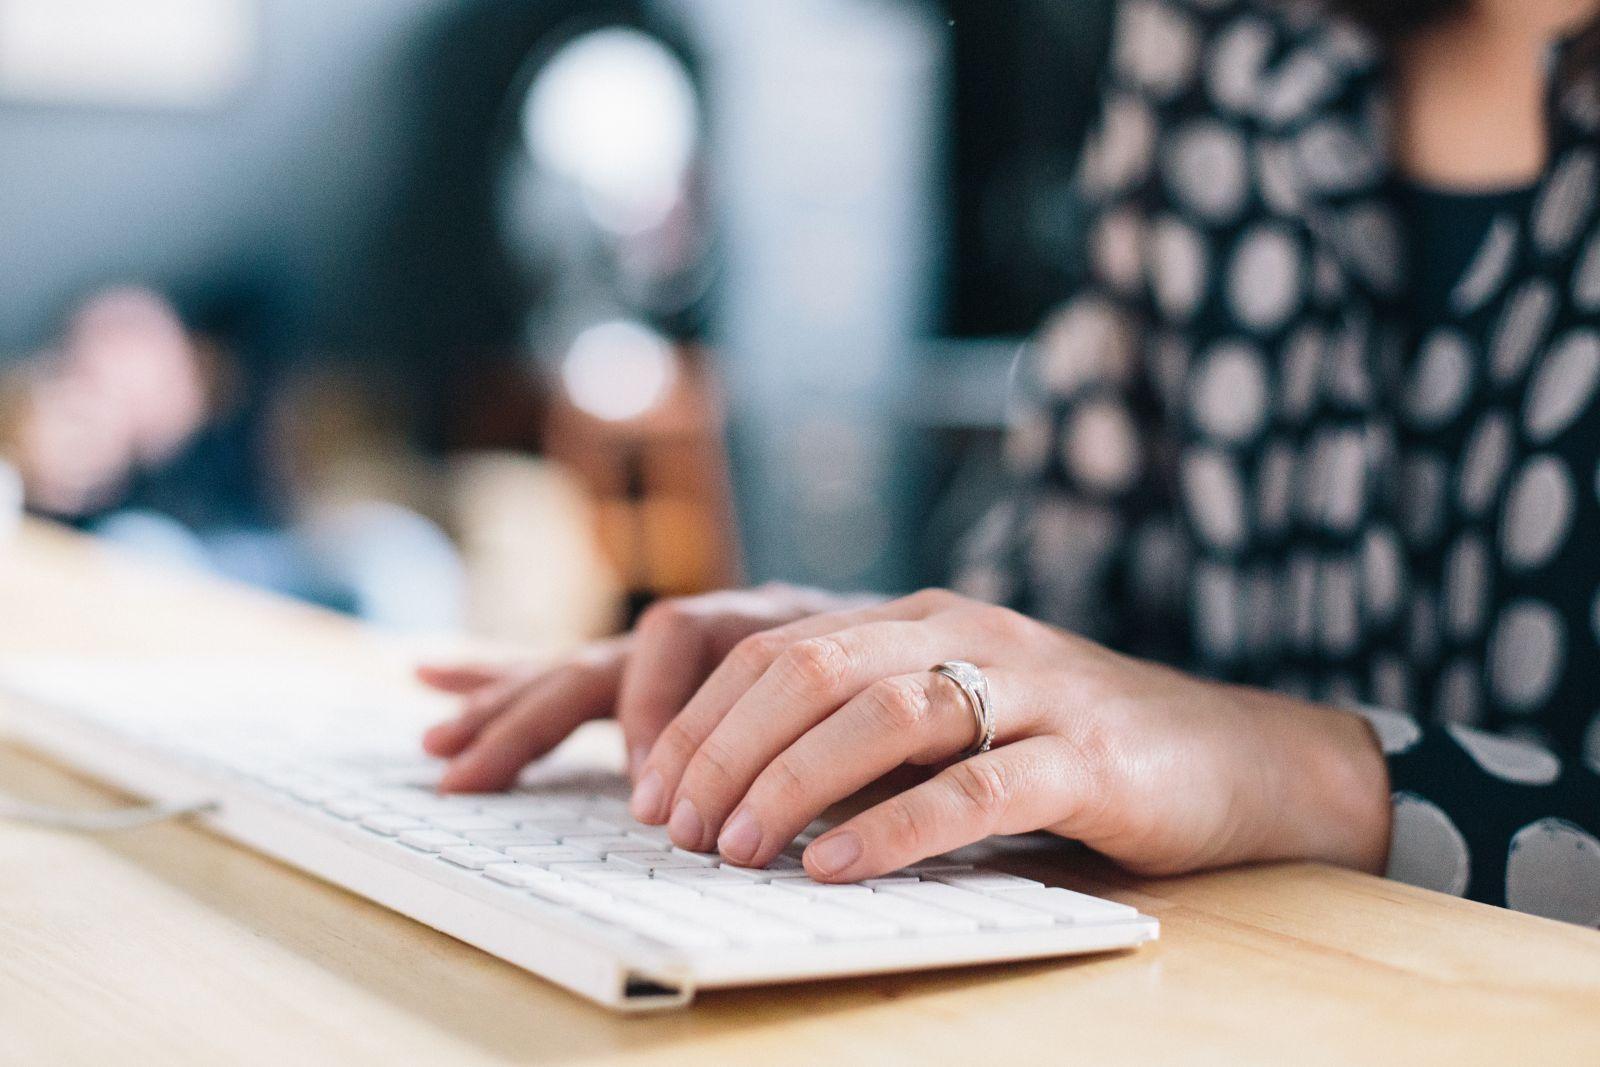 keyboard-typing-working-exercise